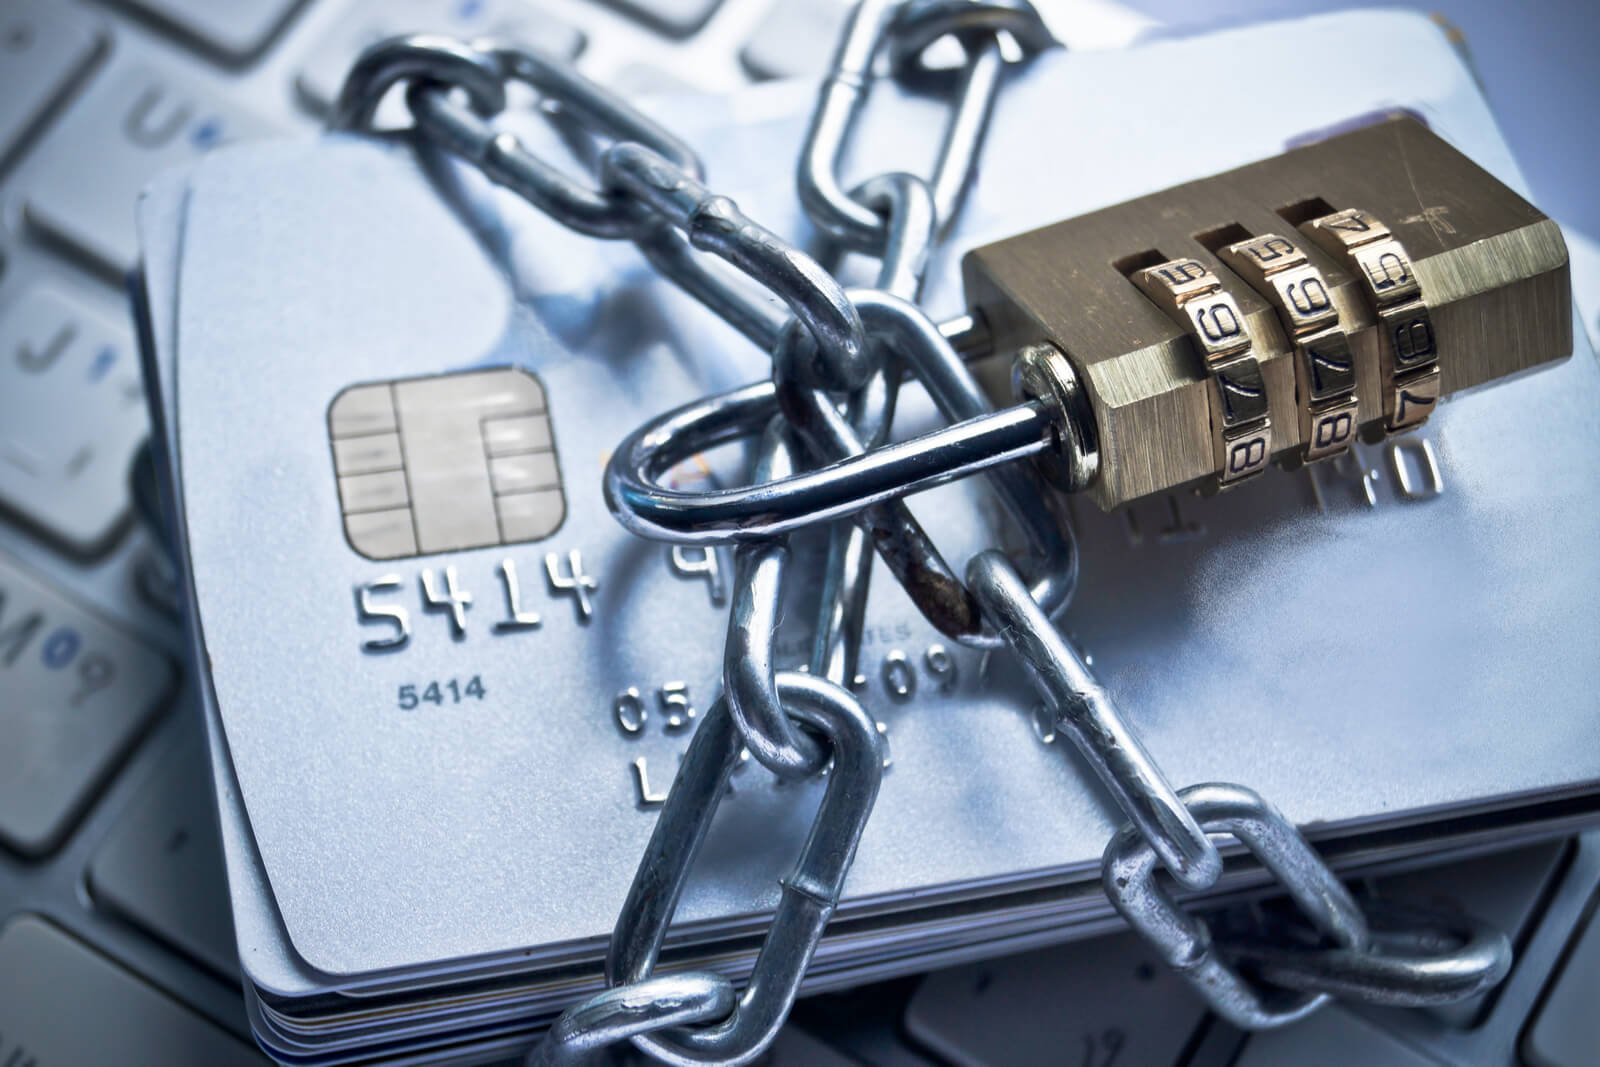 credit card fraud suspe - HD1170×780